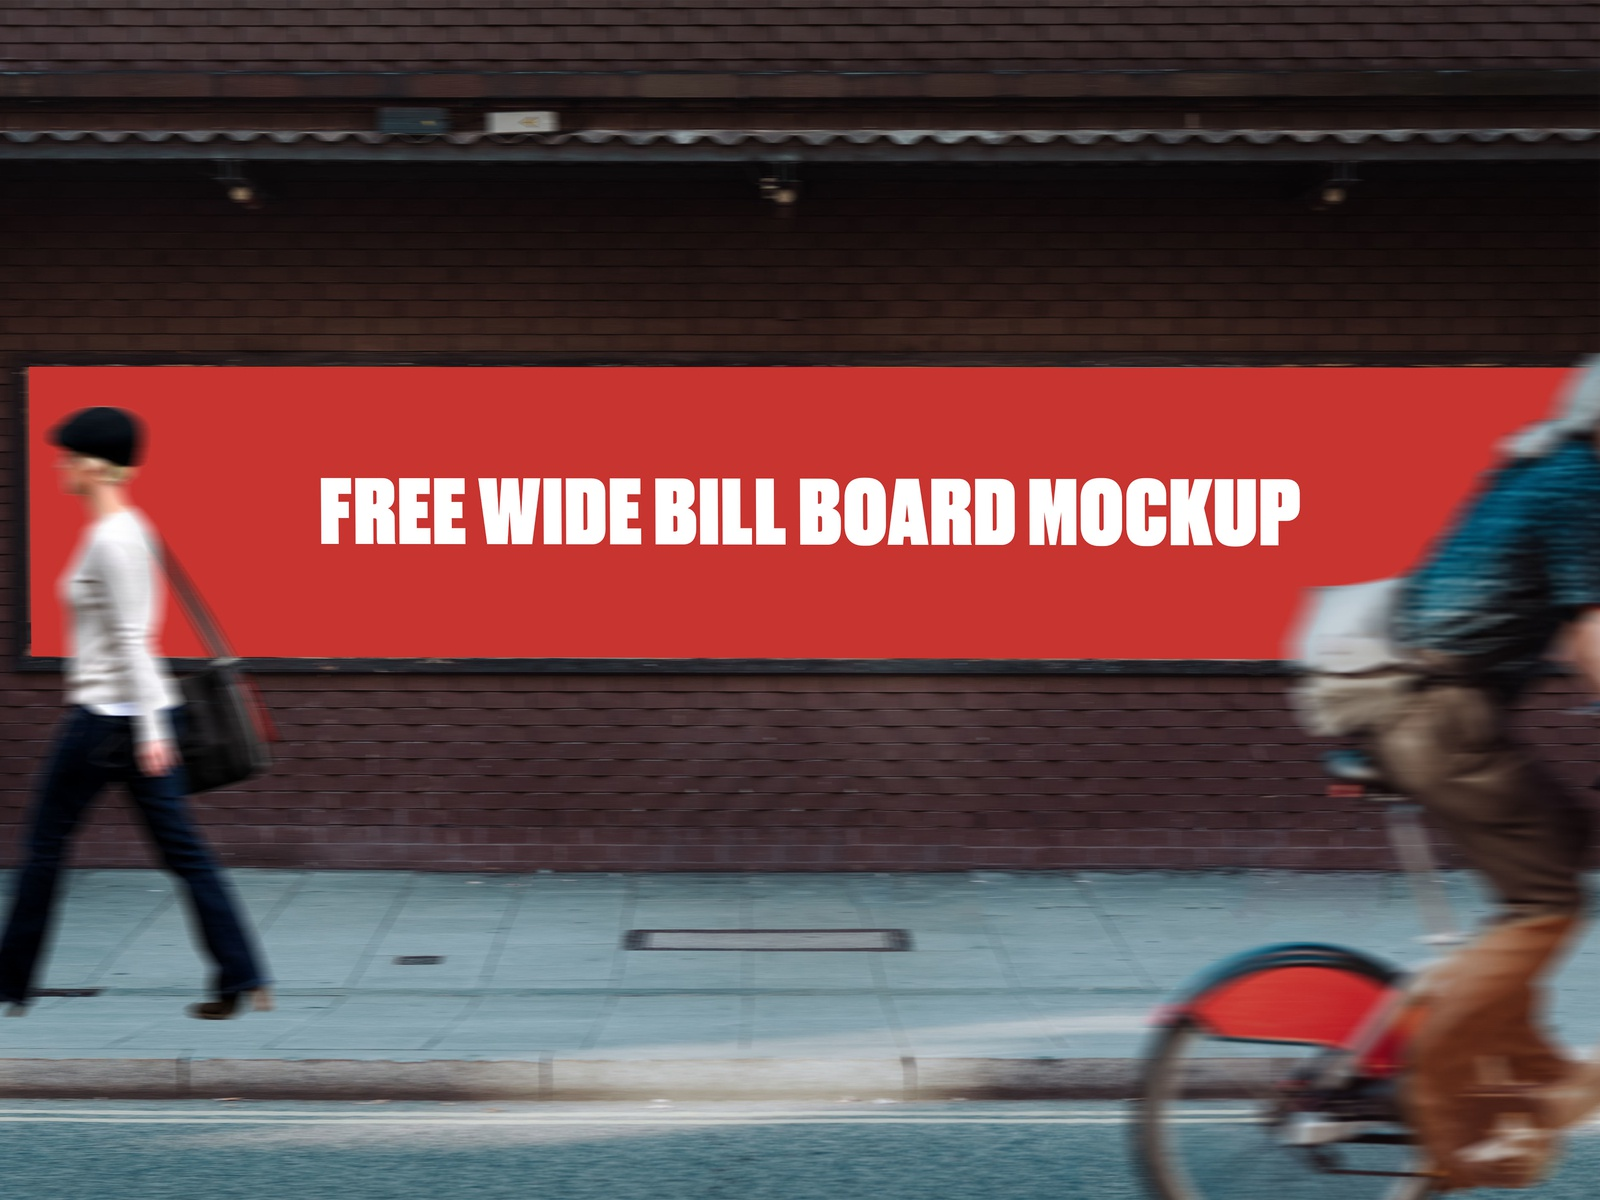 Free Wide Bill Board Mockup billboard banner free mockup freebie psd design branding mockup